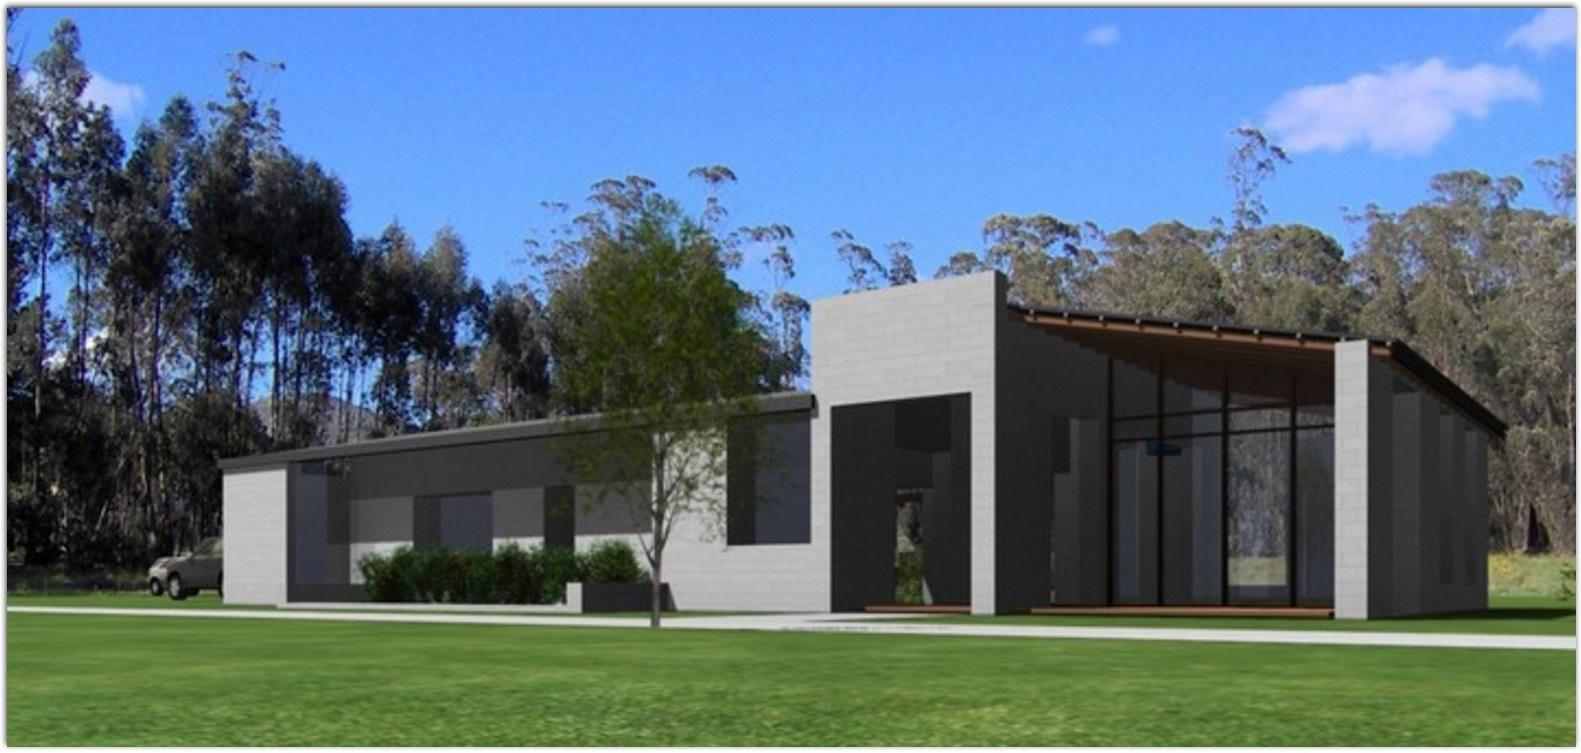 Planos de casas modernas planos de casas gratis y modernas for Frente casa moderna